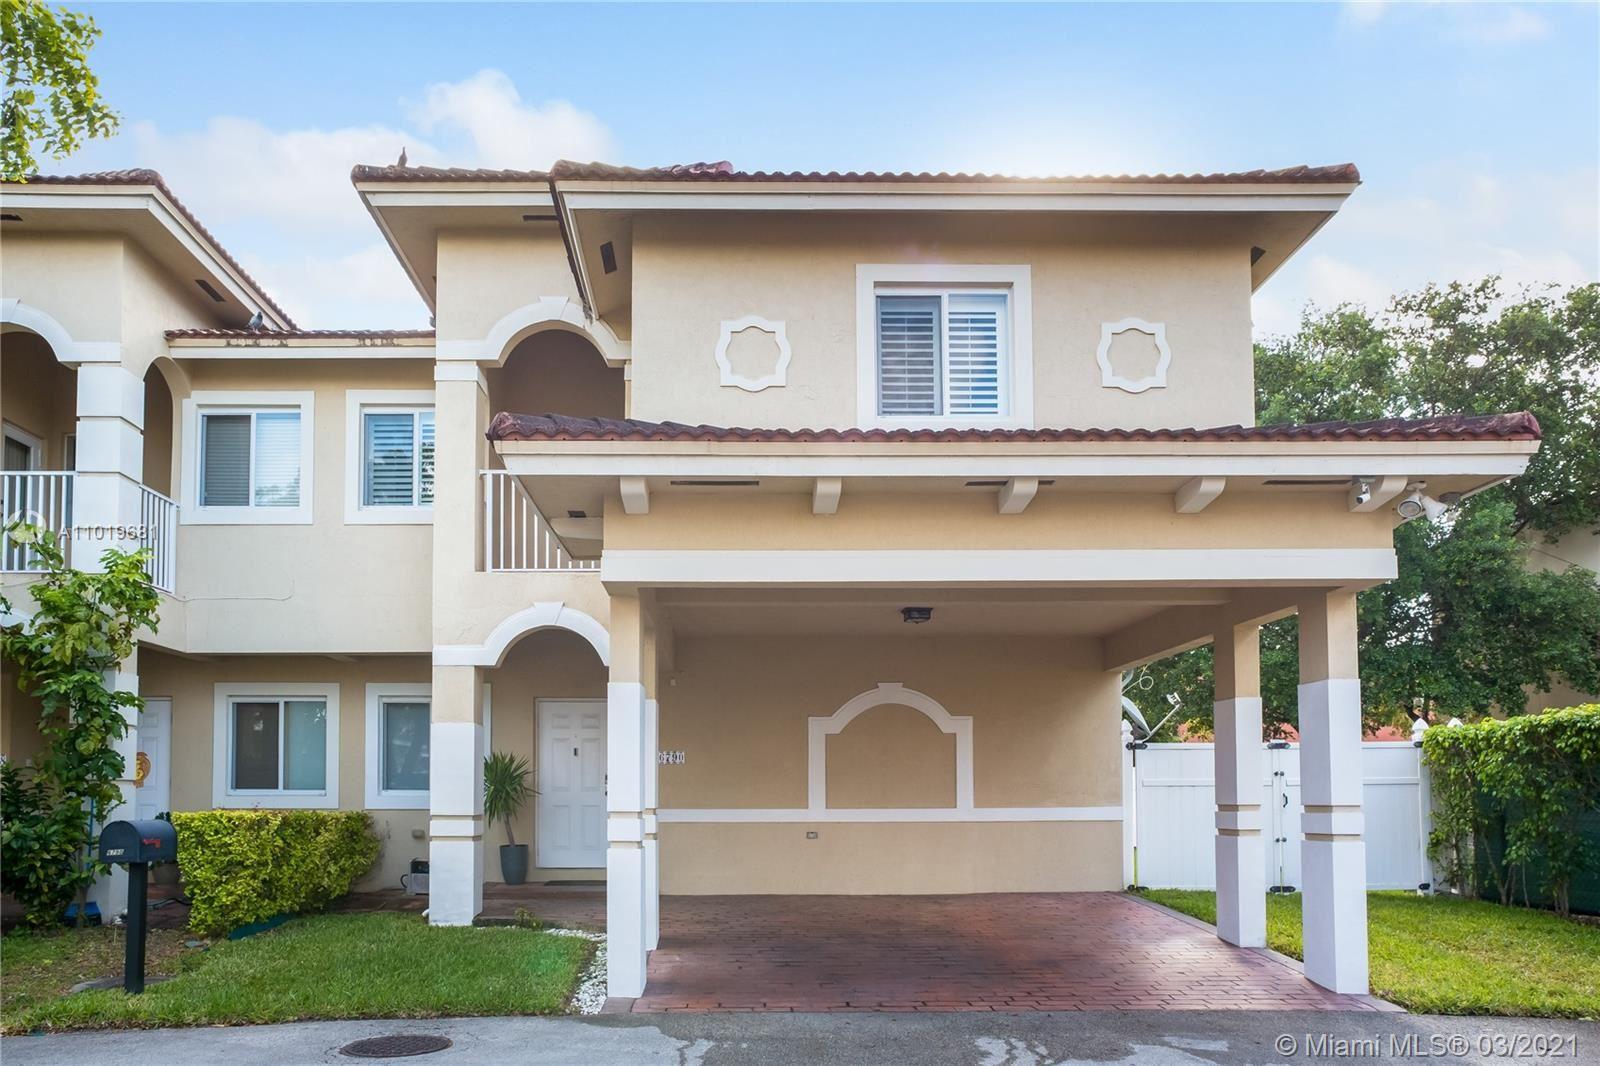 Photo of 6790 SW 22nd St, Miami, FL 33155 (MLS # A11019681)